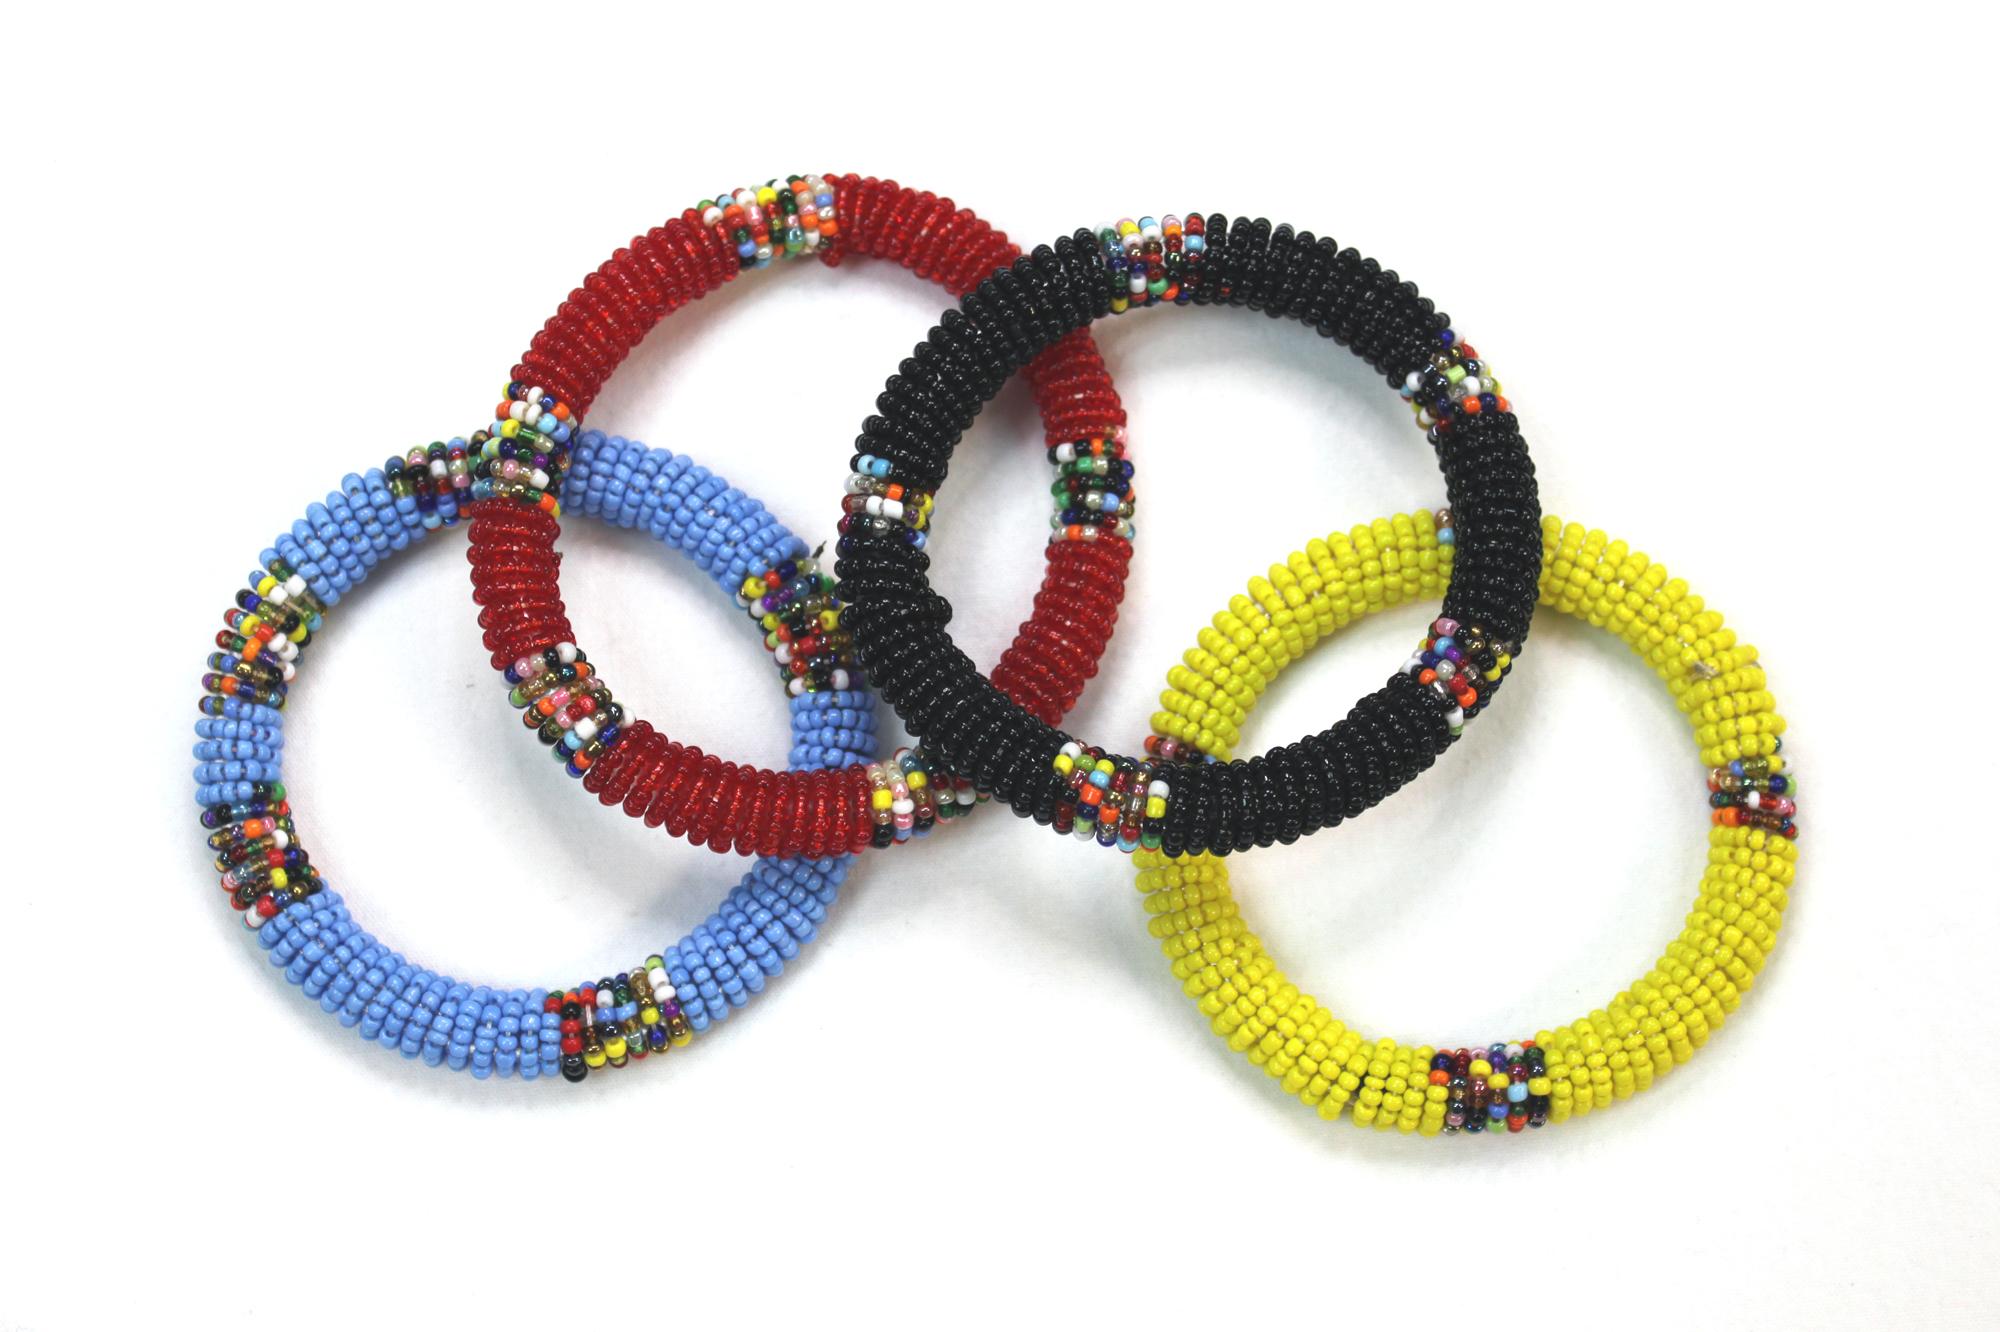 Amazing jewellery from around the globe, by Studio 55